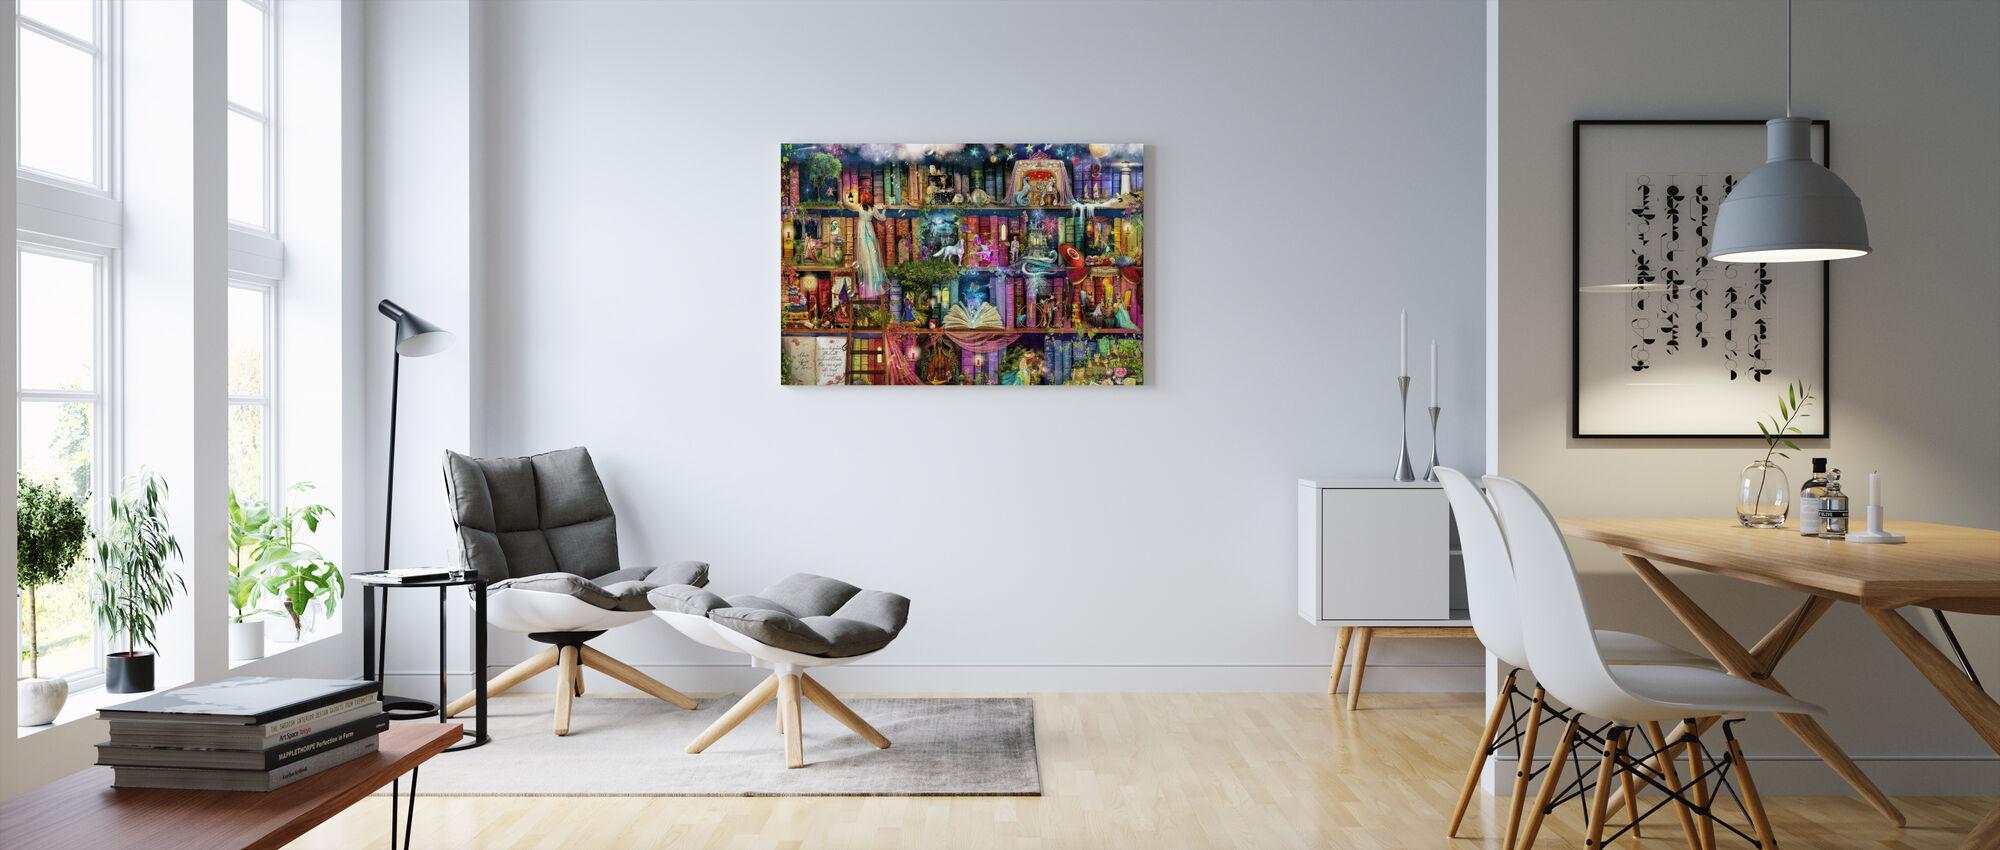 Treasure Hunt Book Shelf - Canvas print - Living Room